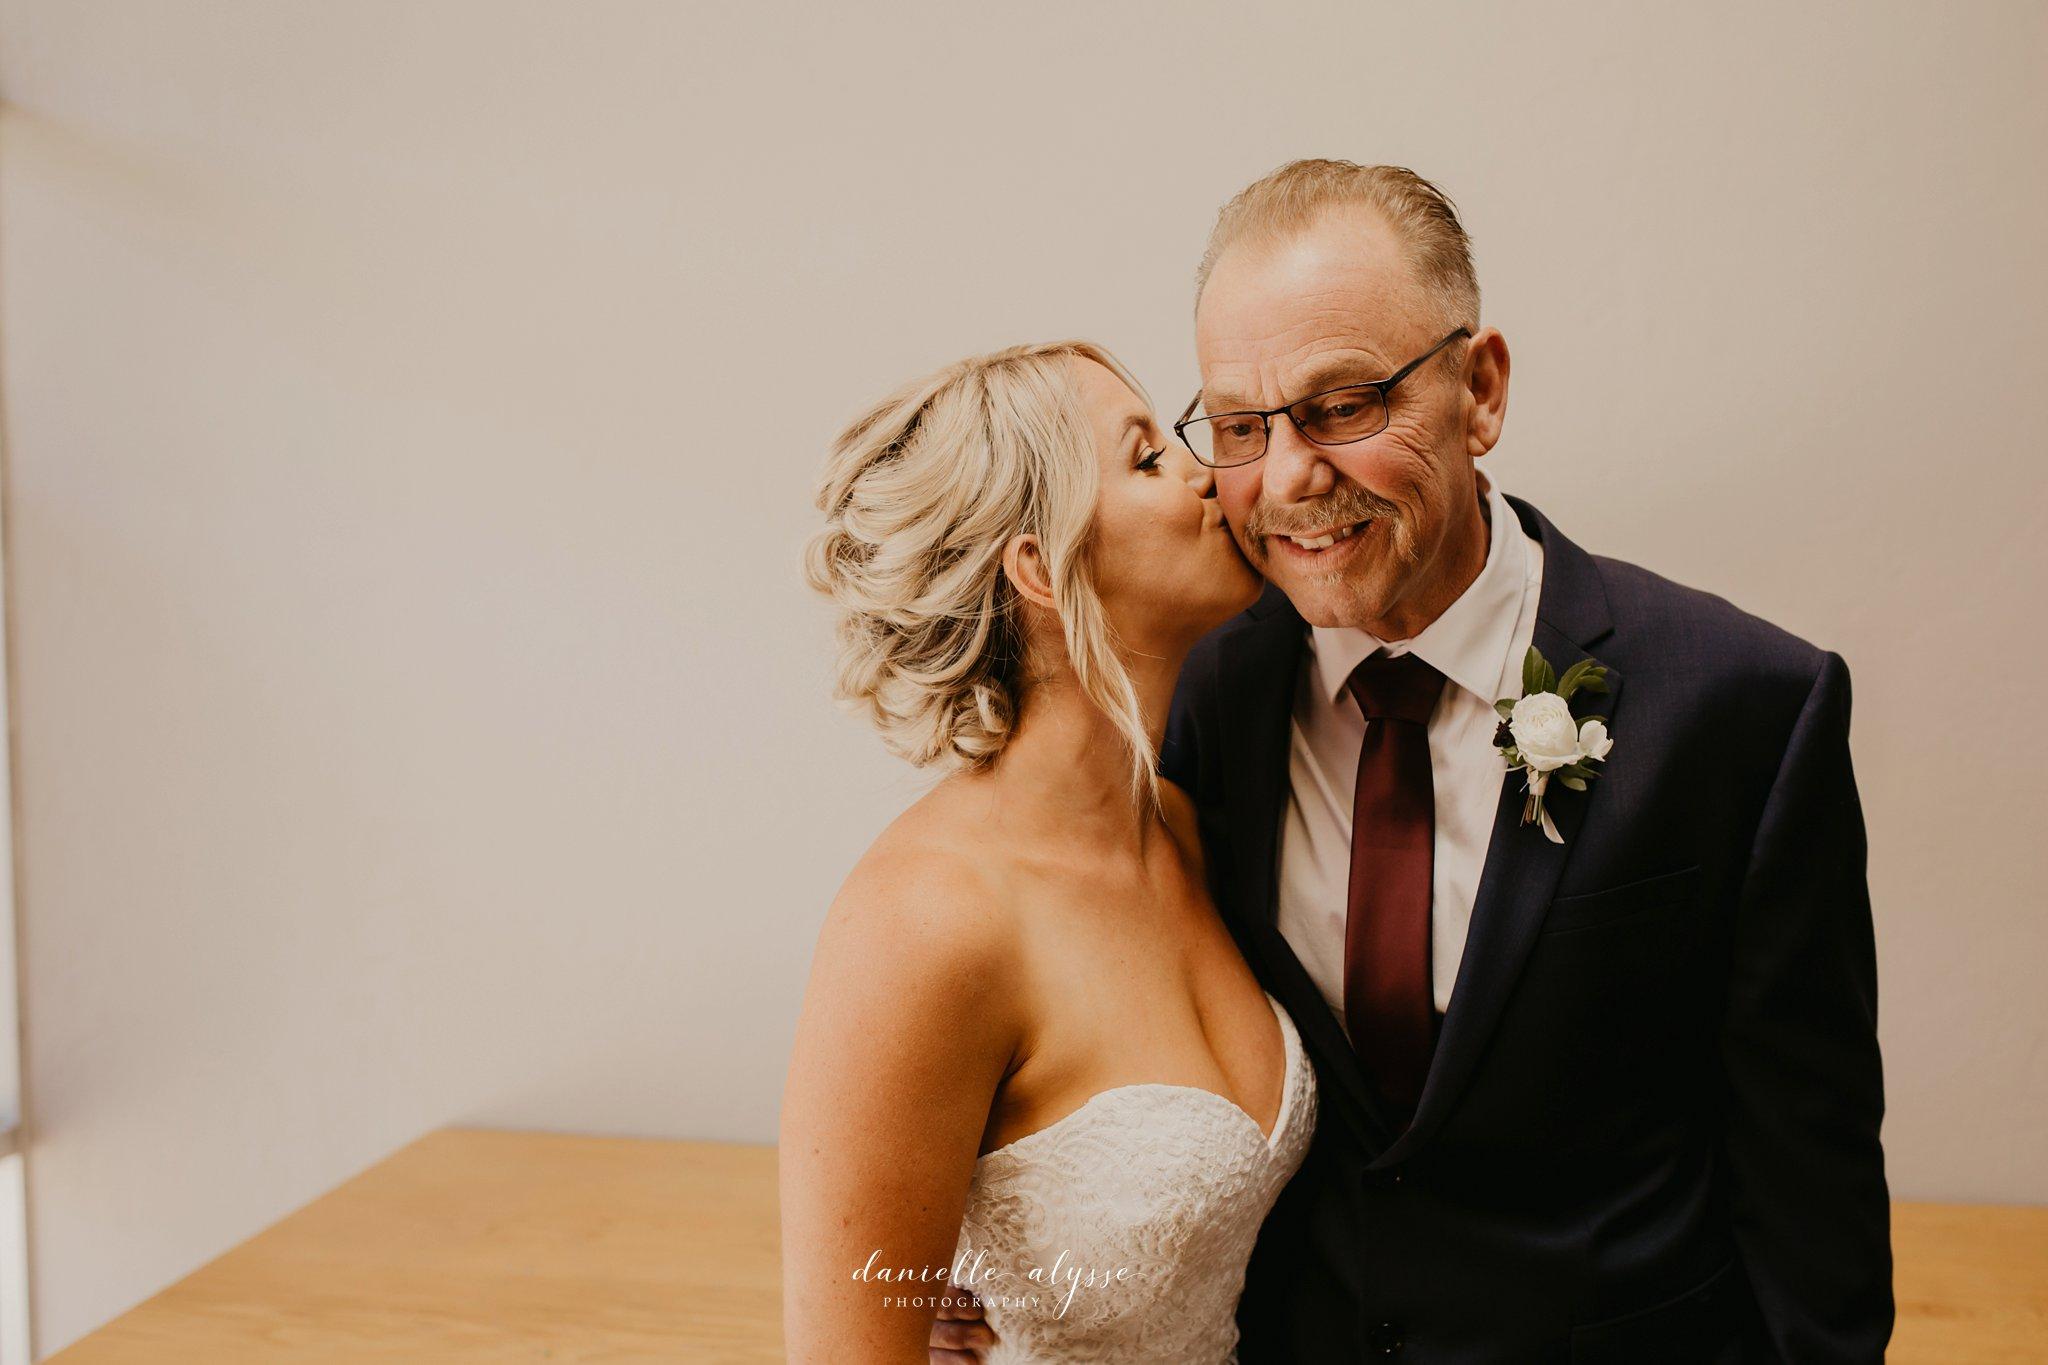 180831_wedding_stephanie_heavenly_south_lake_tahoe_danielle_alysse_photography_destination_blog_430_WEB.jpg